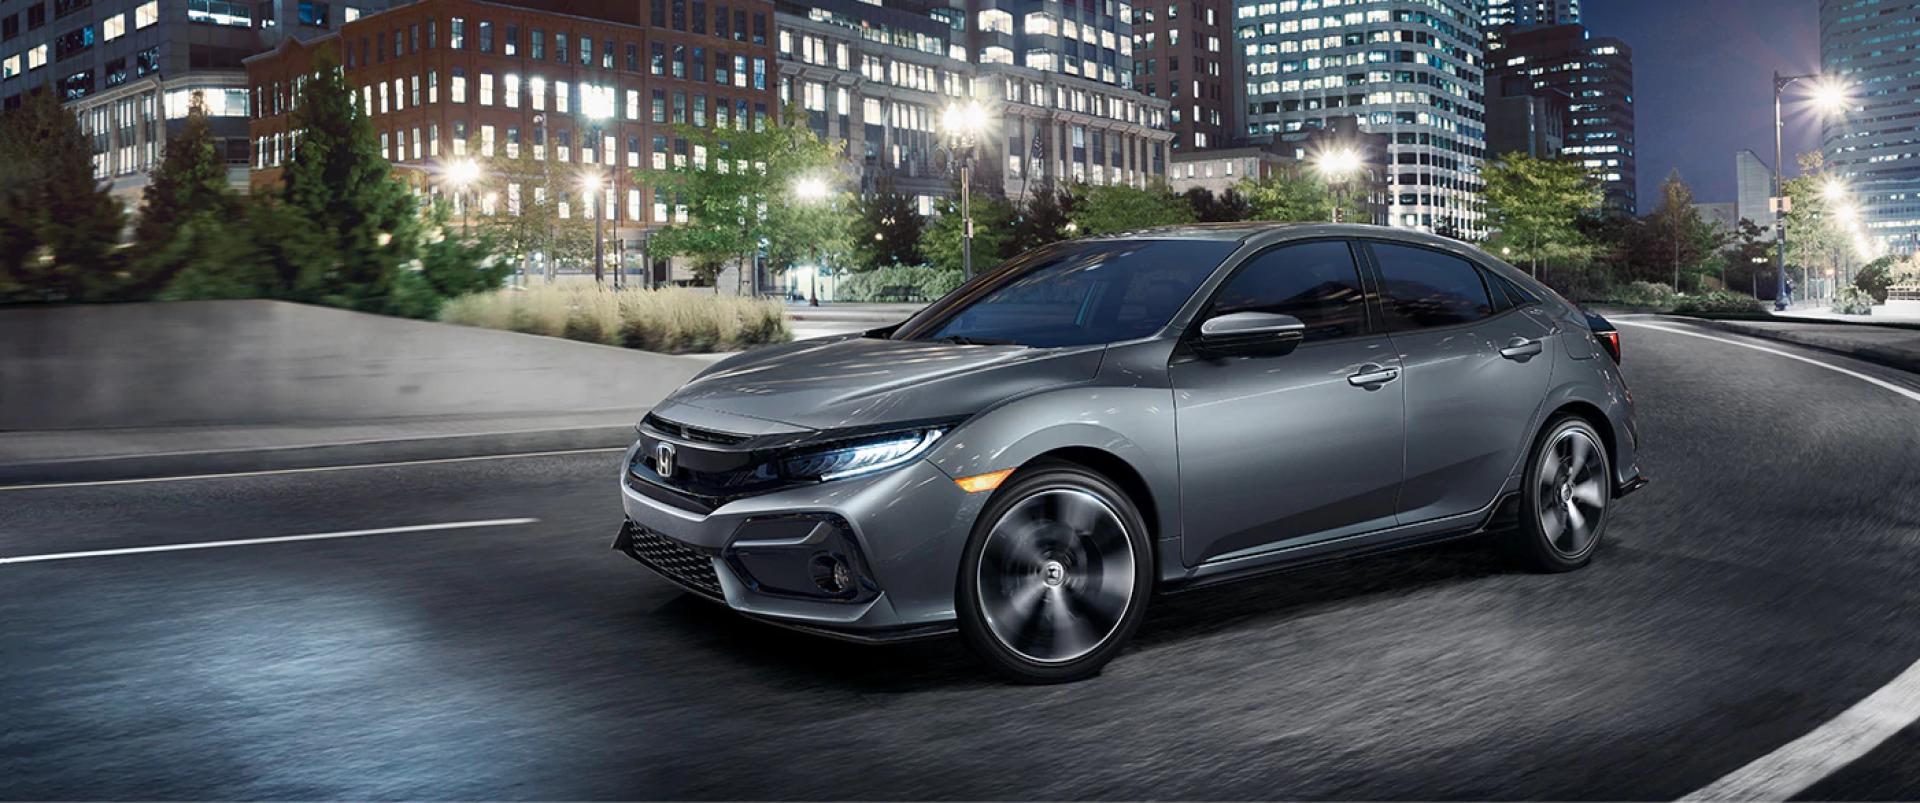 Honda_Civic_Hatchback_Driving_In_City_At_Night